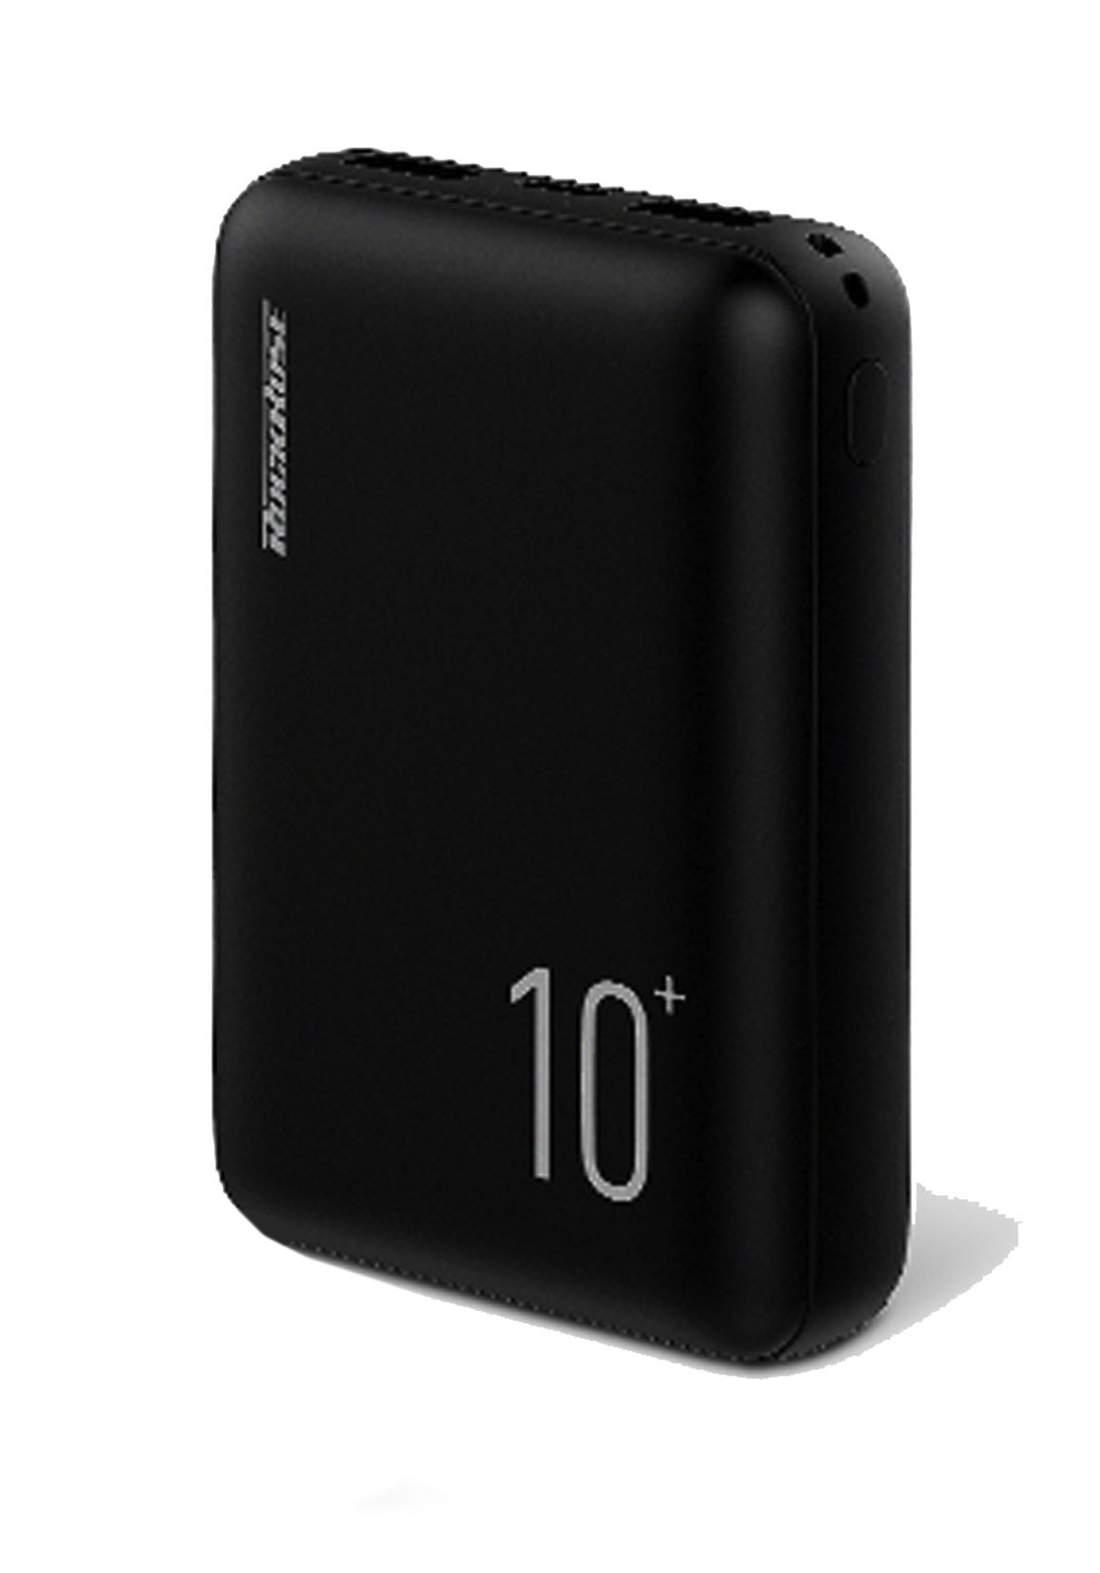 (4032)Rockrose RRPB02 Power Bank  Oasis 10S Dual Port 10000 mAh - Black باور